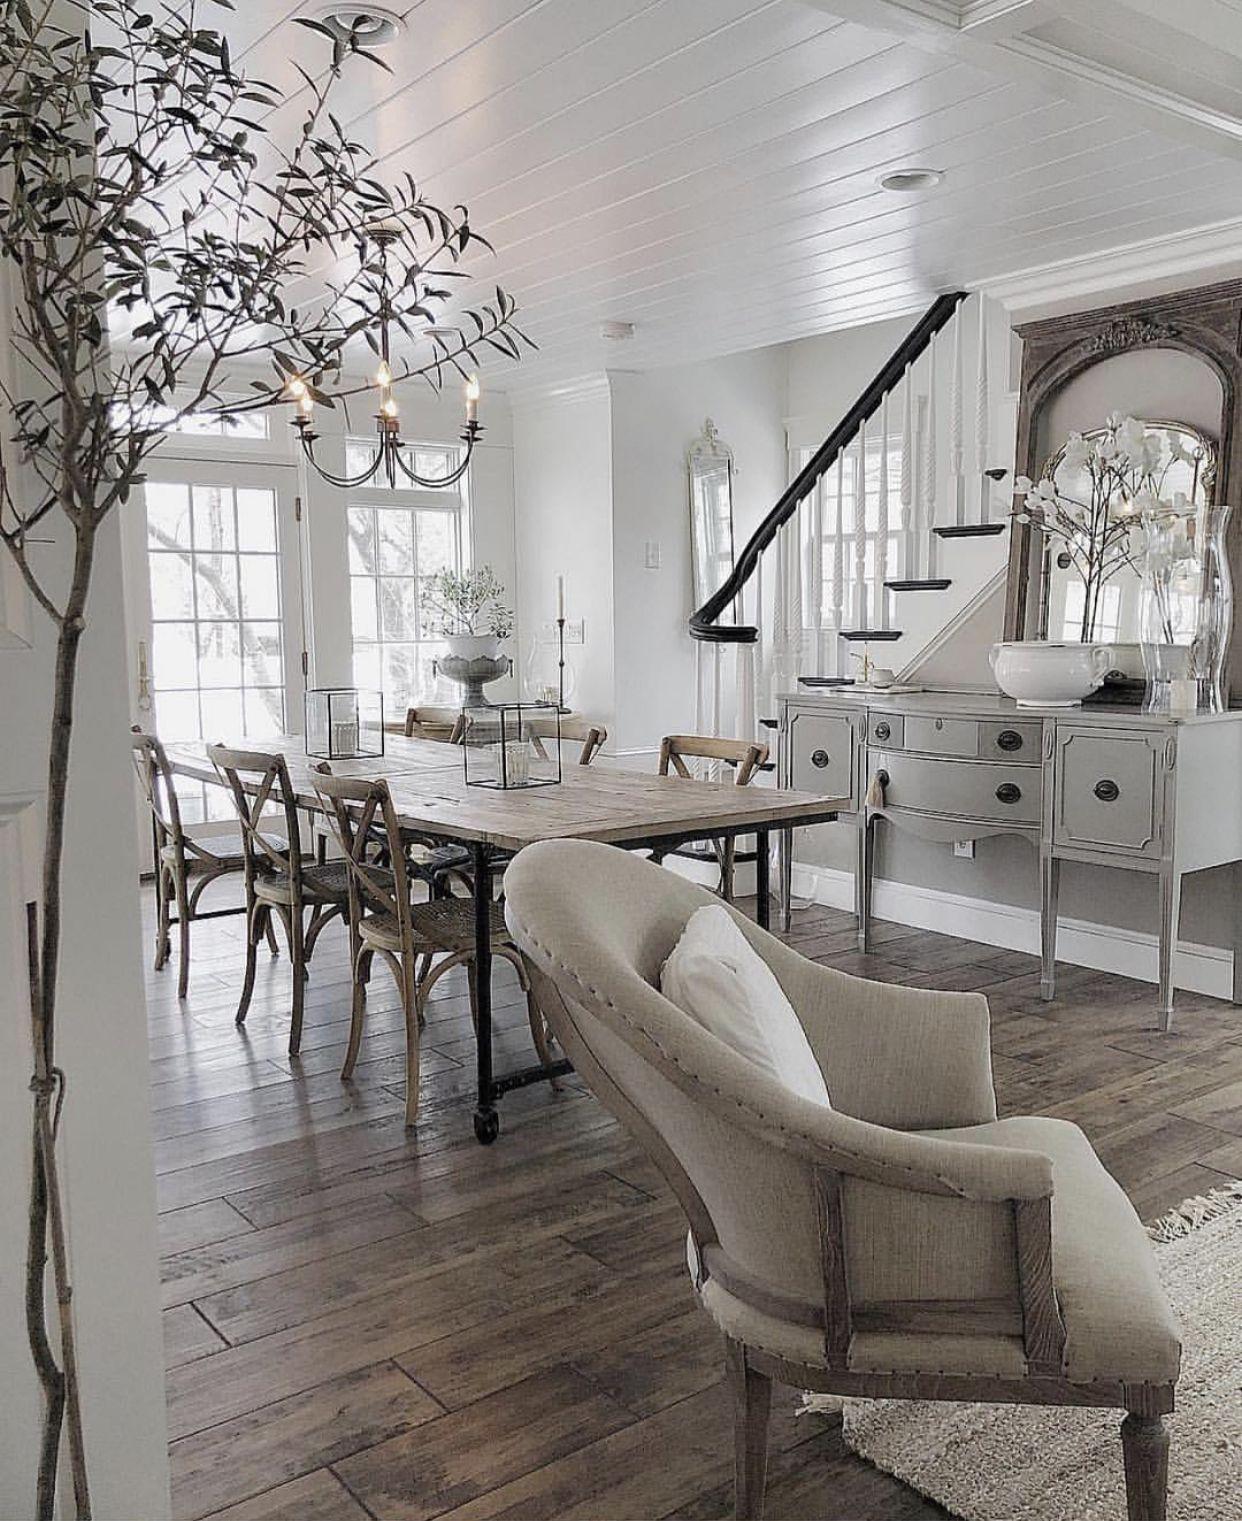 Featherglass Farm House Living Room Living Room Trends Dining Room Interiors #urban #farmhouse #living #room